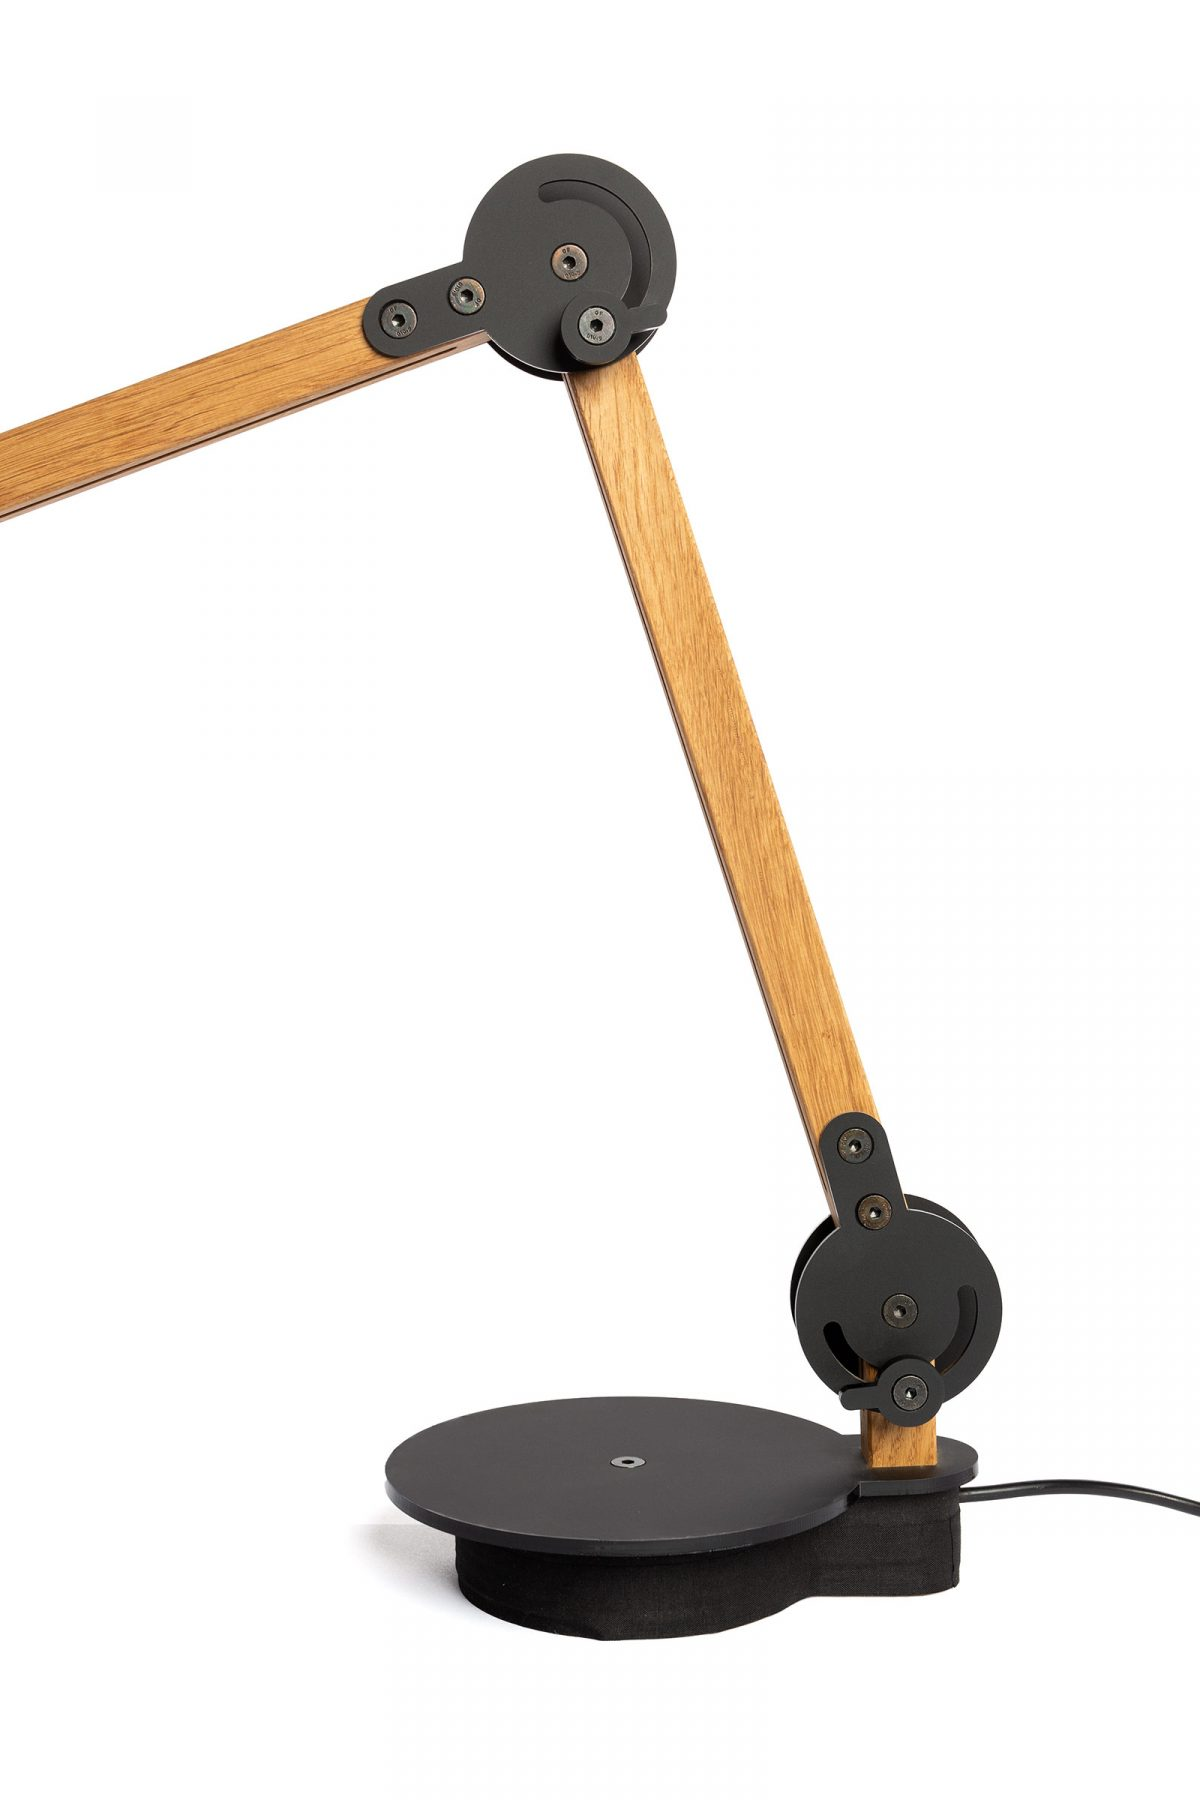 Circle Spot Table Lamp Double Arend Groosman Design Flexibel Bureaulamp